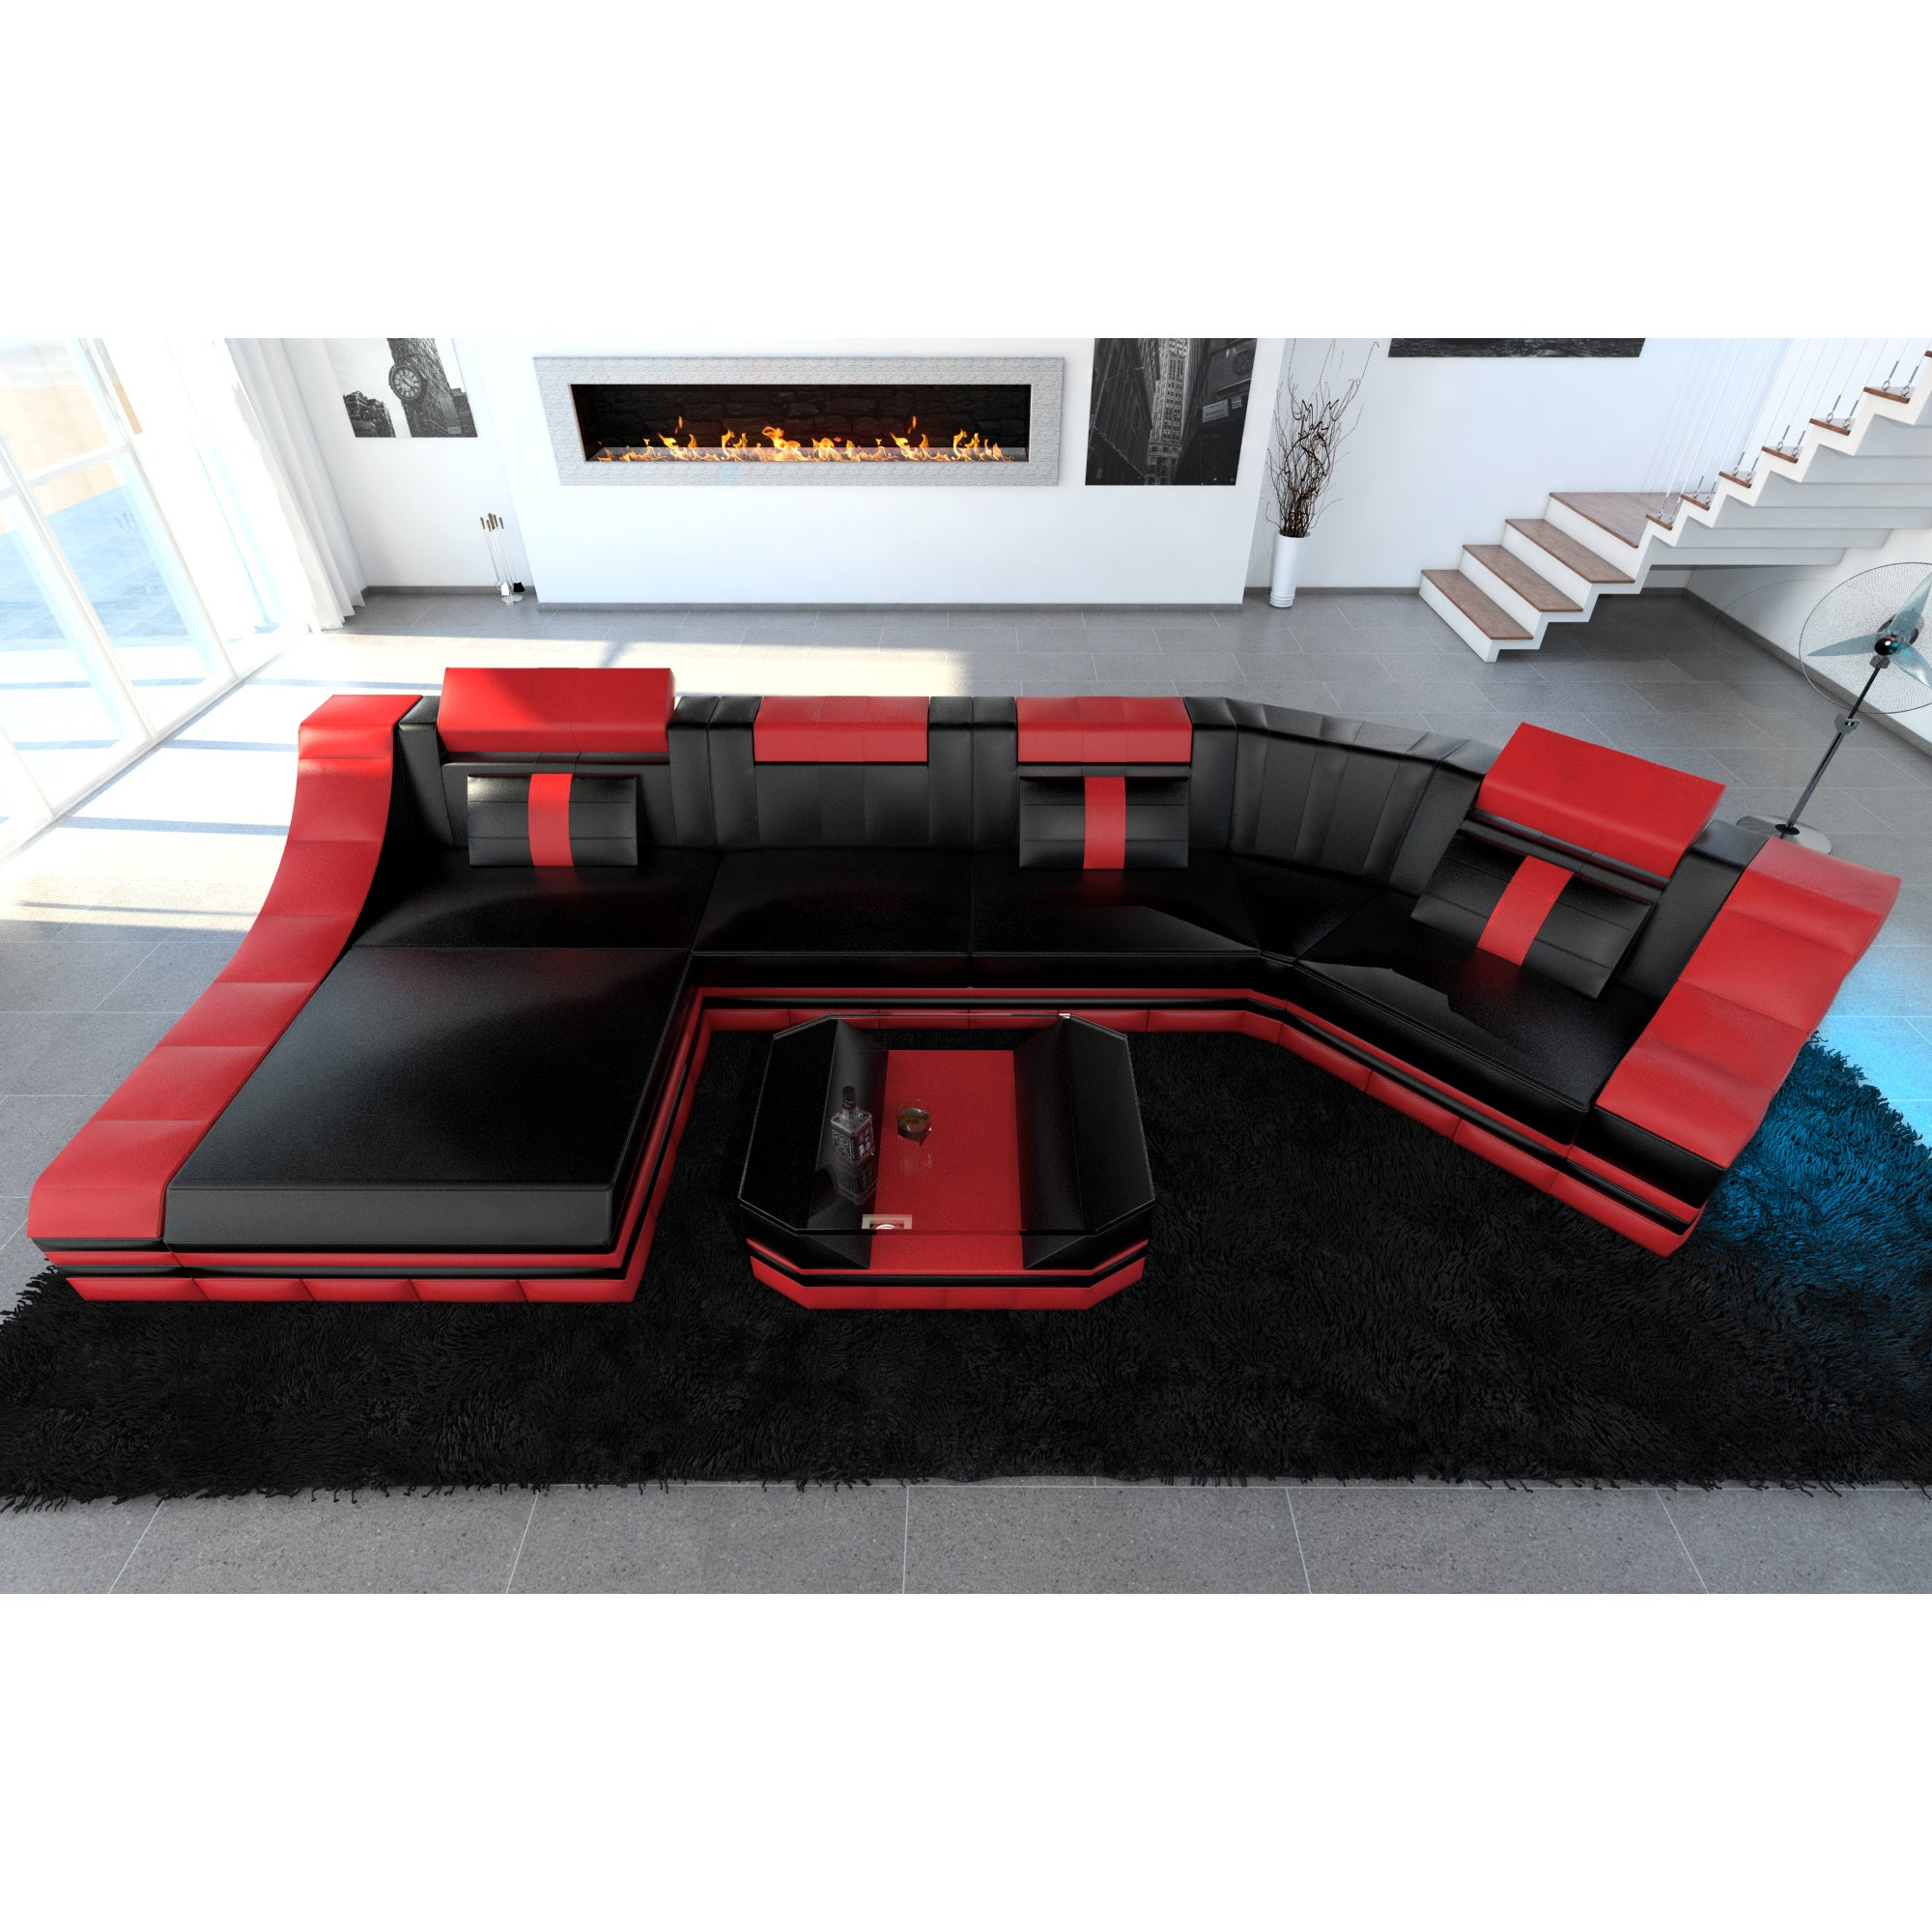 Luxury Sectional Sofa New York C Shape LED Lights